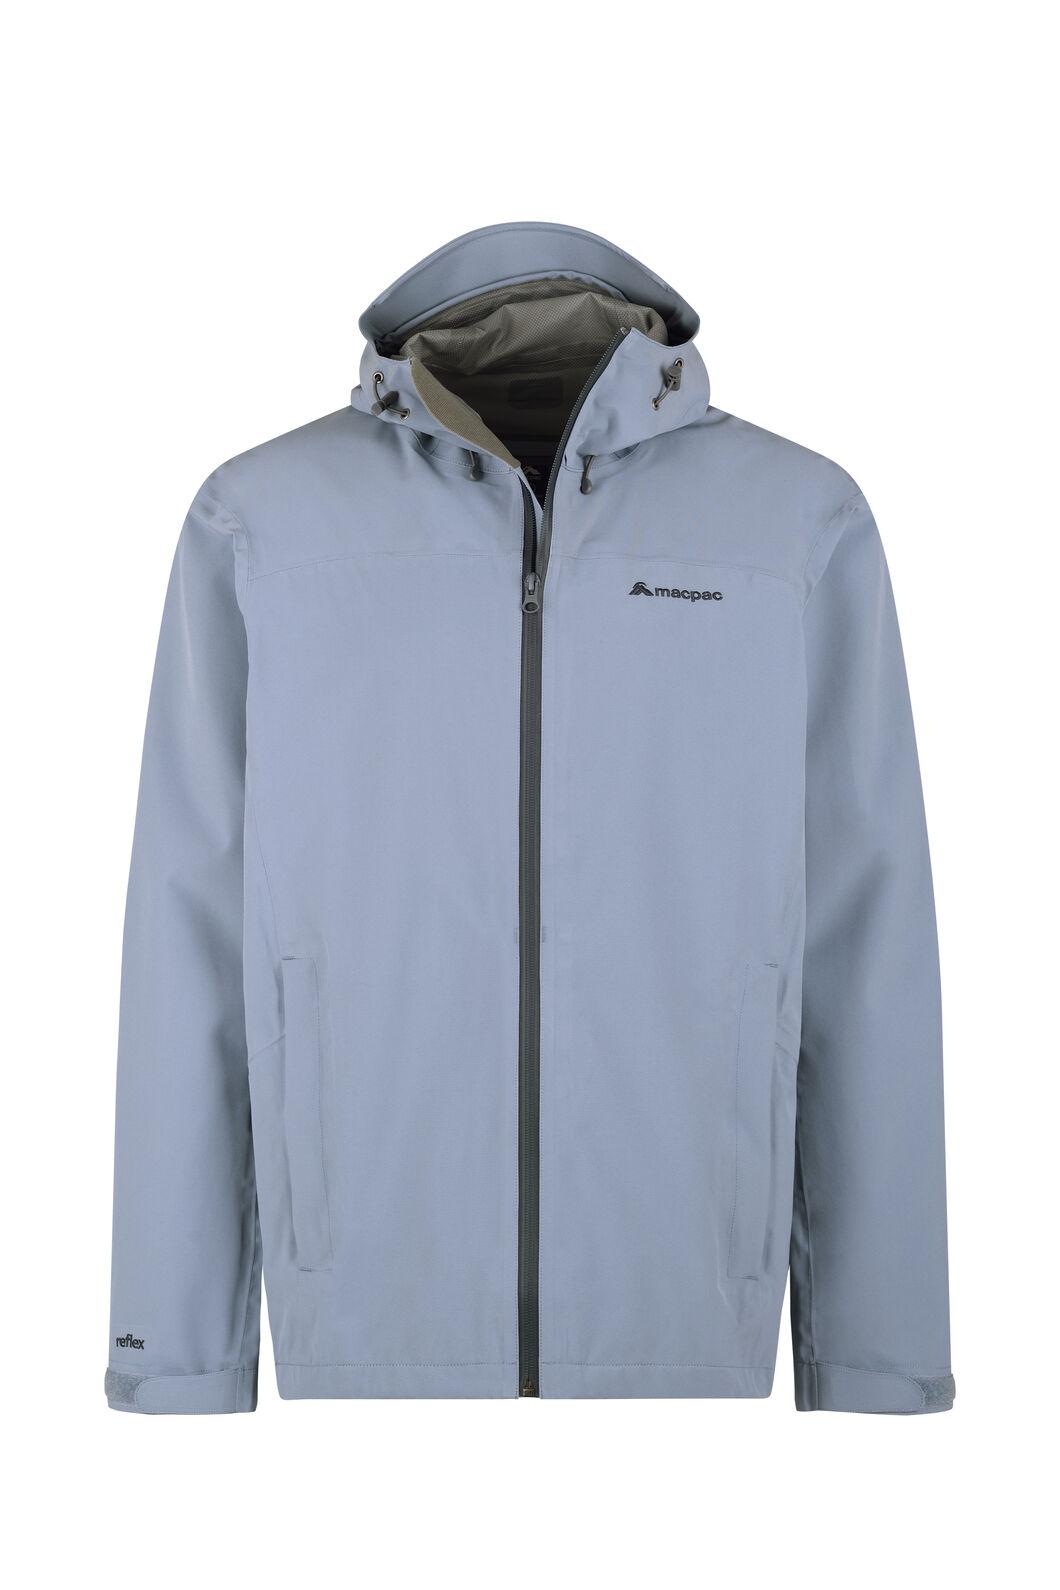 Macpac Dispatch Rain Jacket — Men's, Flint Stone, hi-res